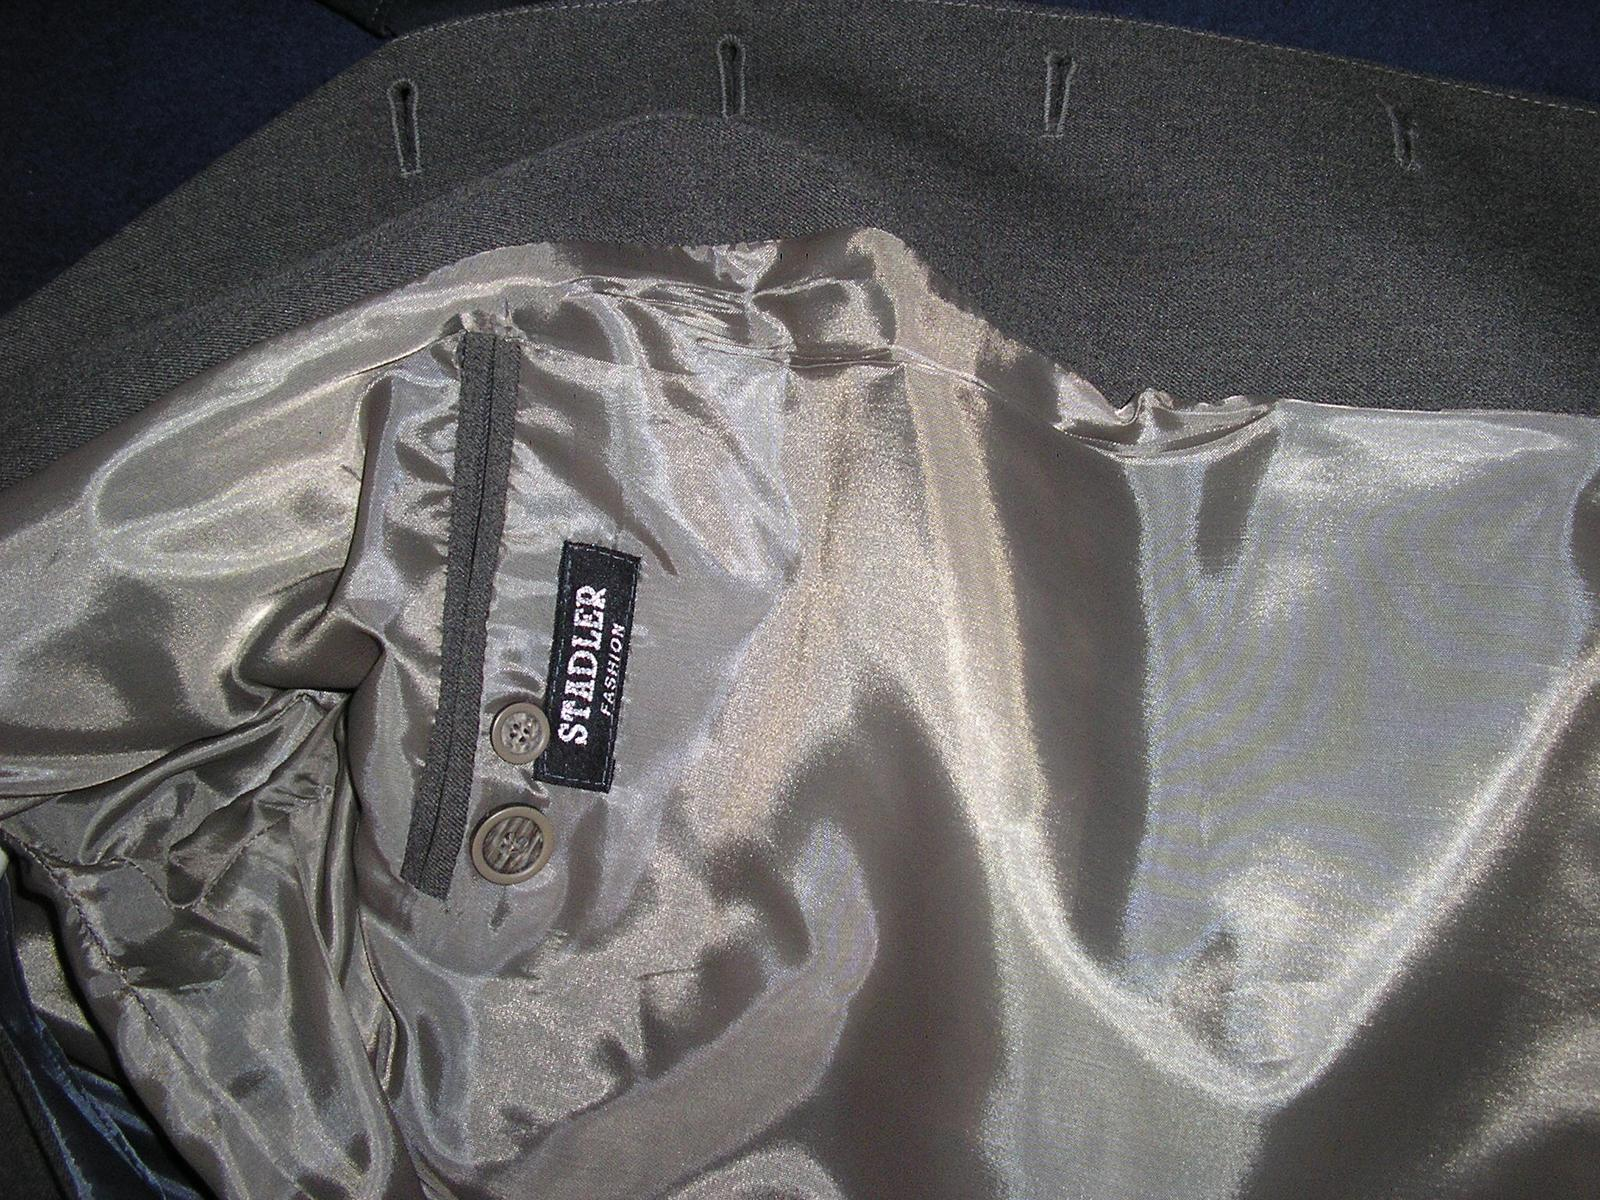 1291. Stadler Faschion sivý oblek - Obrázok č. 3